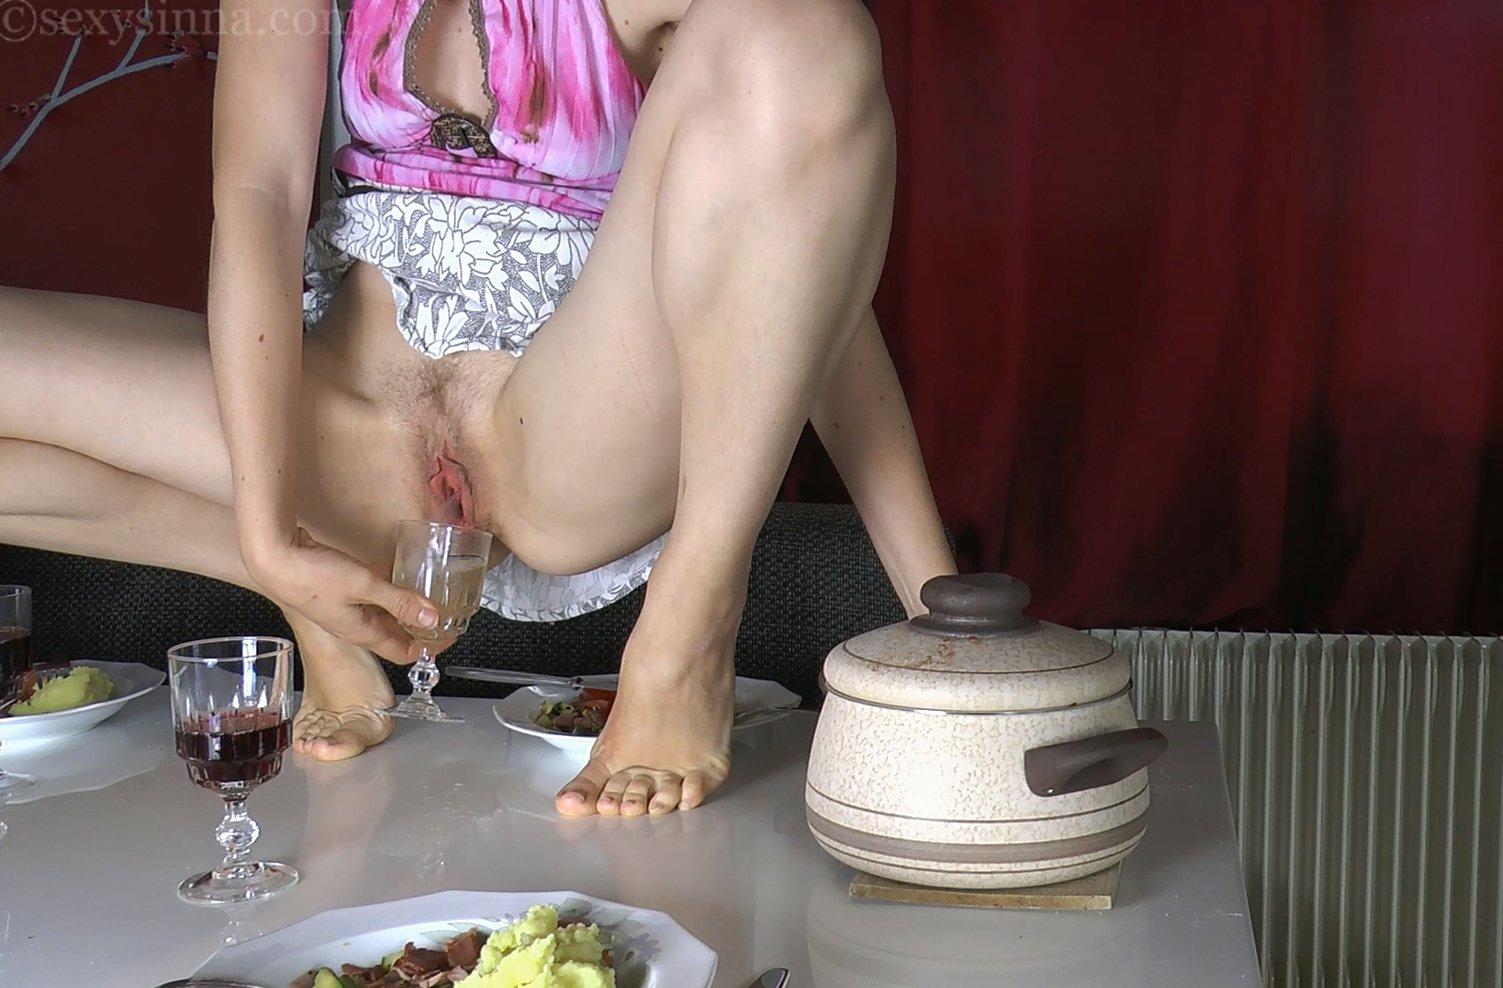 Dinner with wine anyone? :) @24_7_Juan_Kerr @AdrianXDome @Peeing_Girls @Marks9875 @Vary4420 #pee #peeing #2pee4you https://t.co/KXJztQDgO0